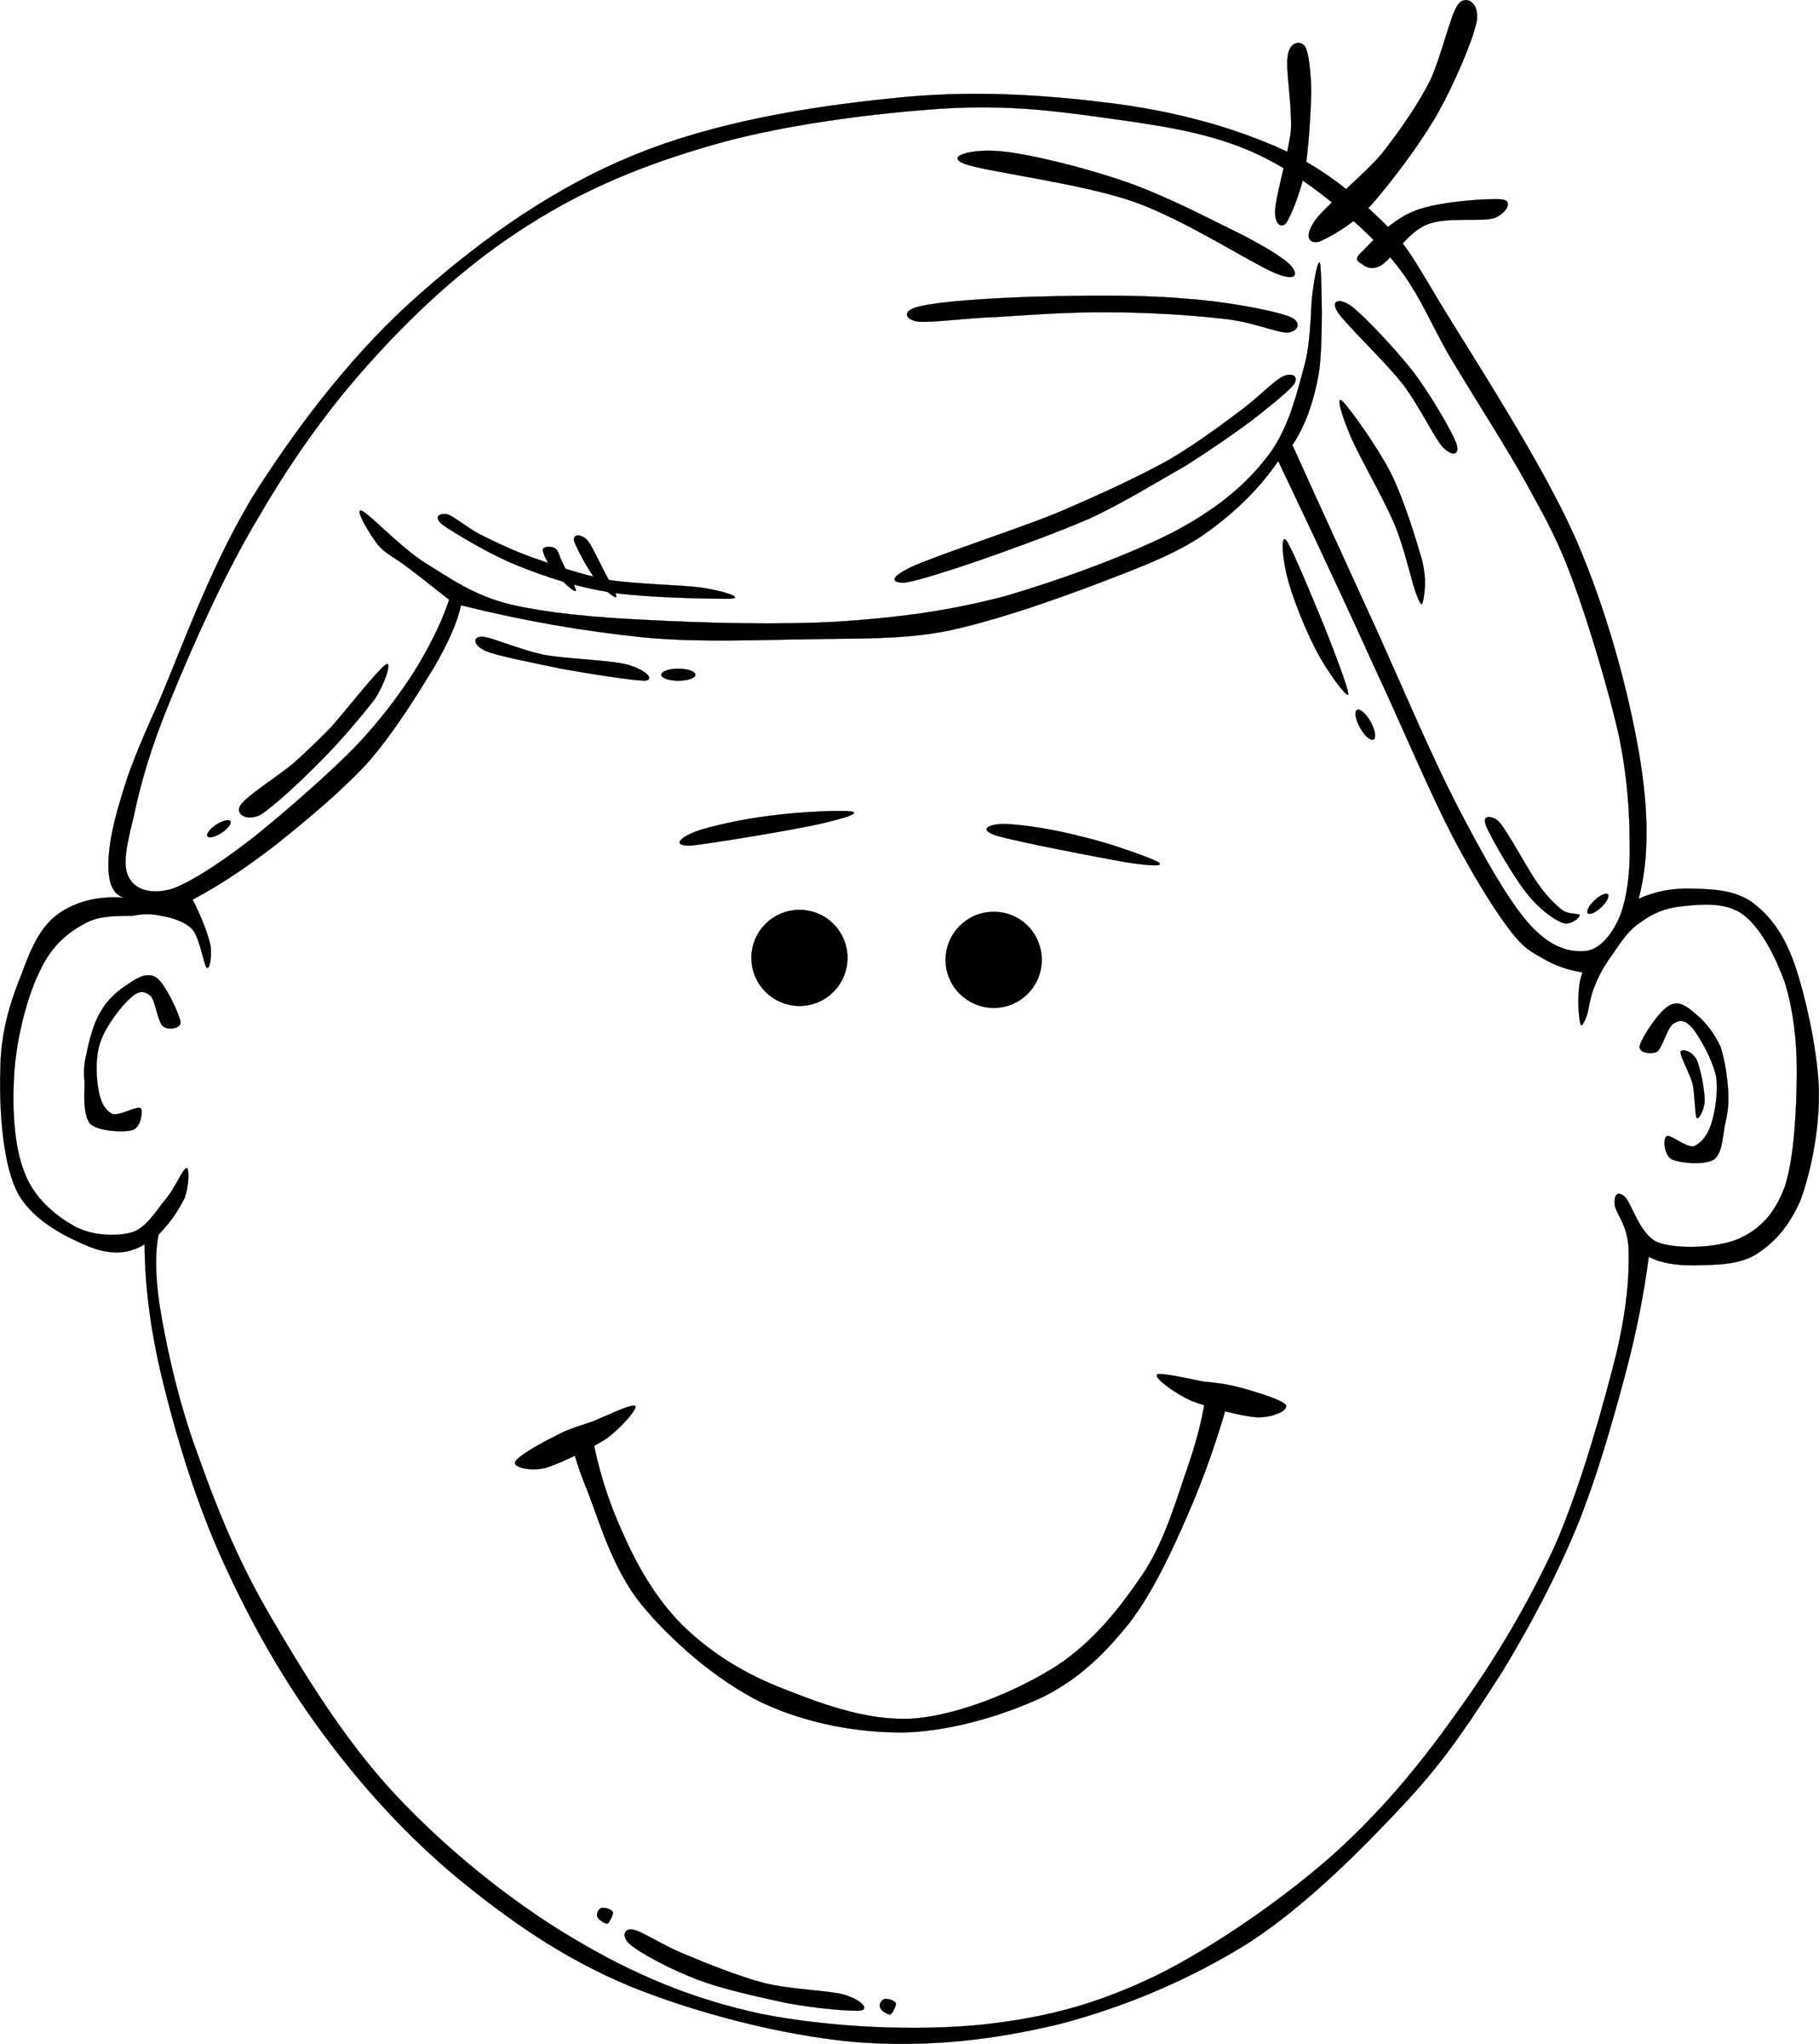 Man face cartoon big. Faces clipart basic emotion